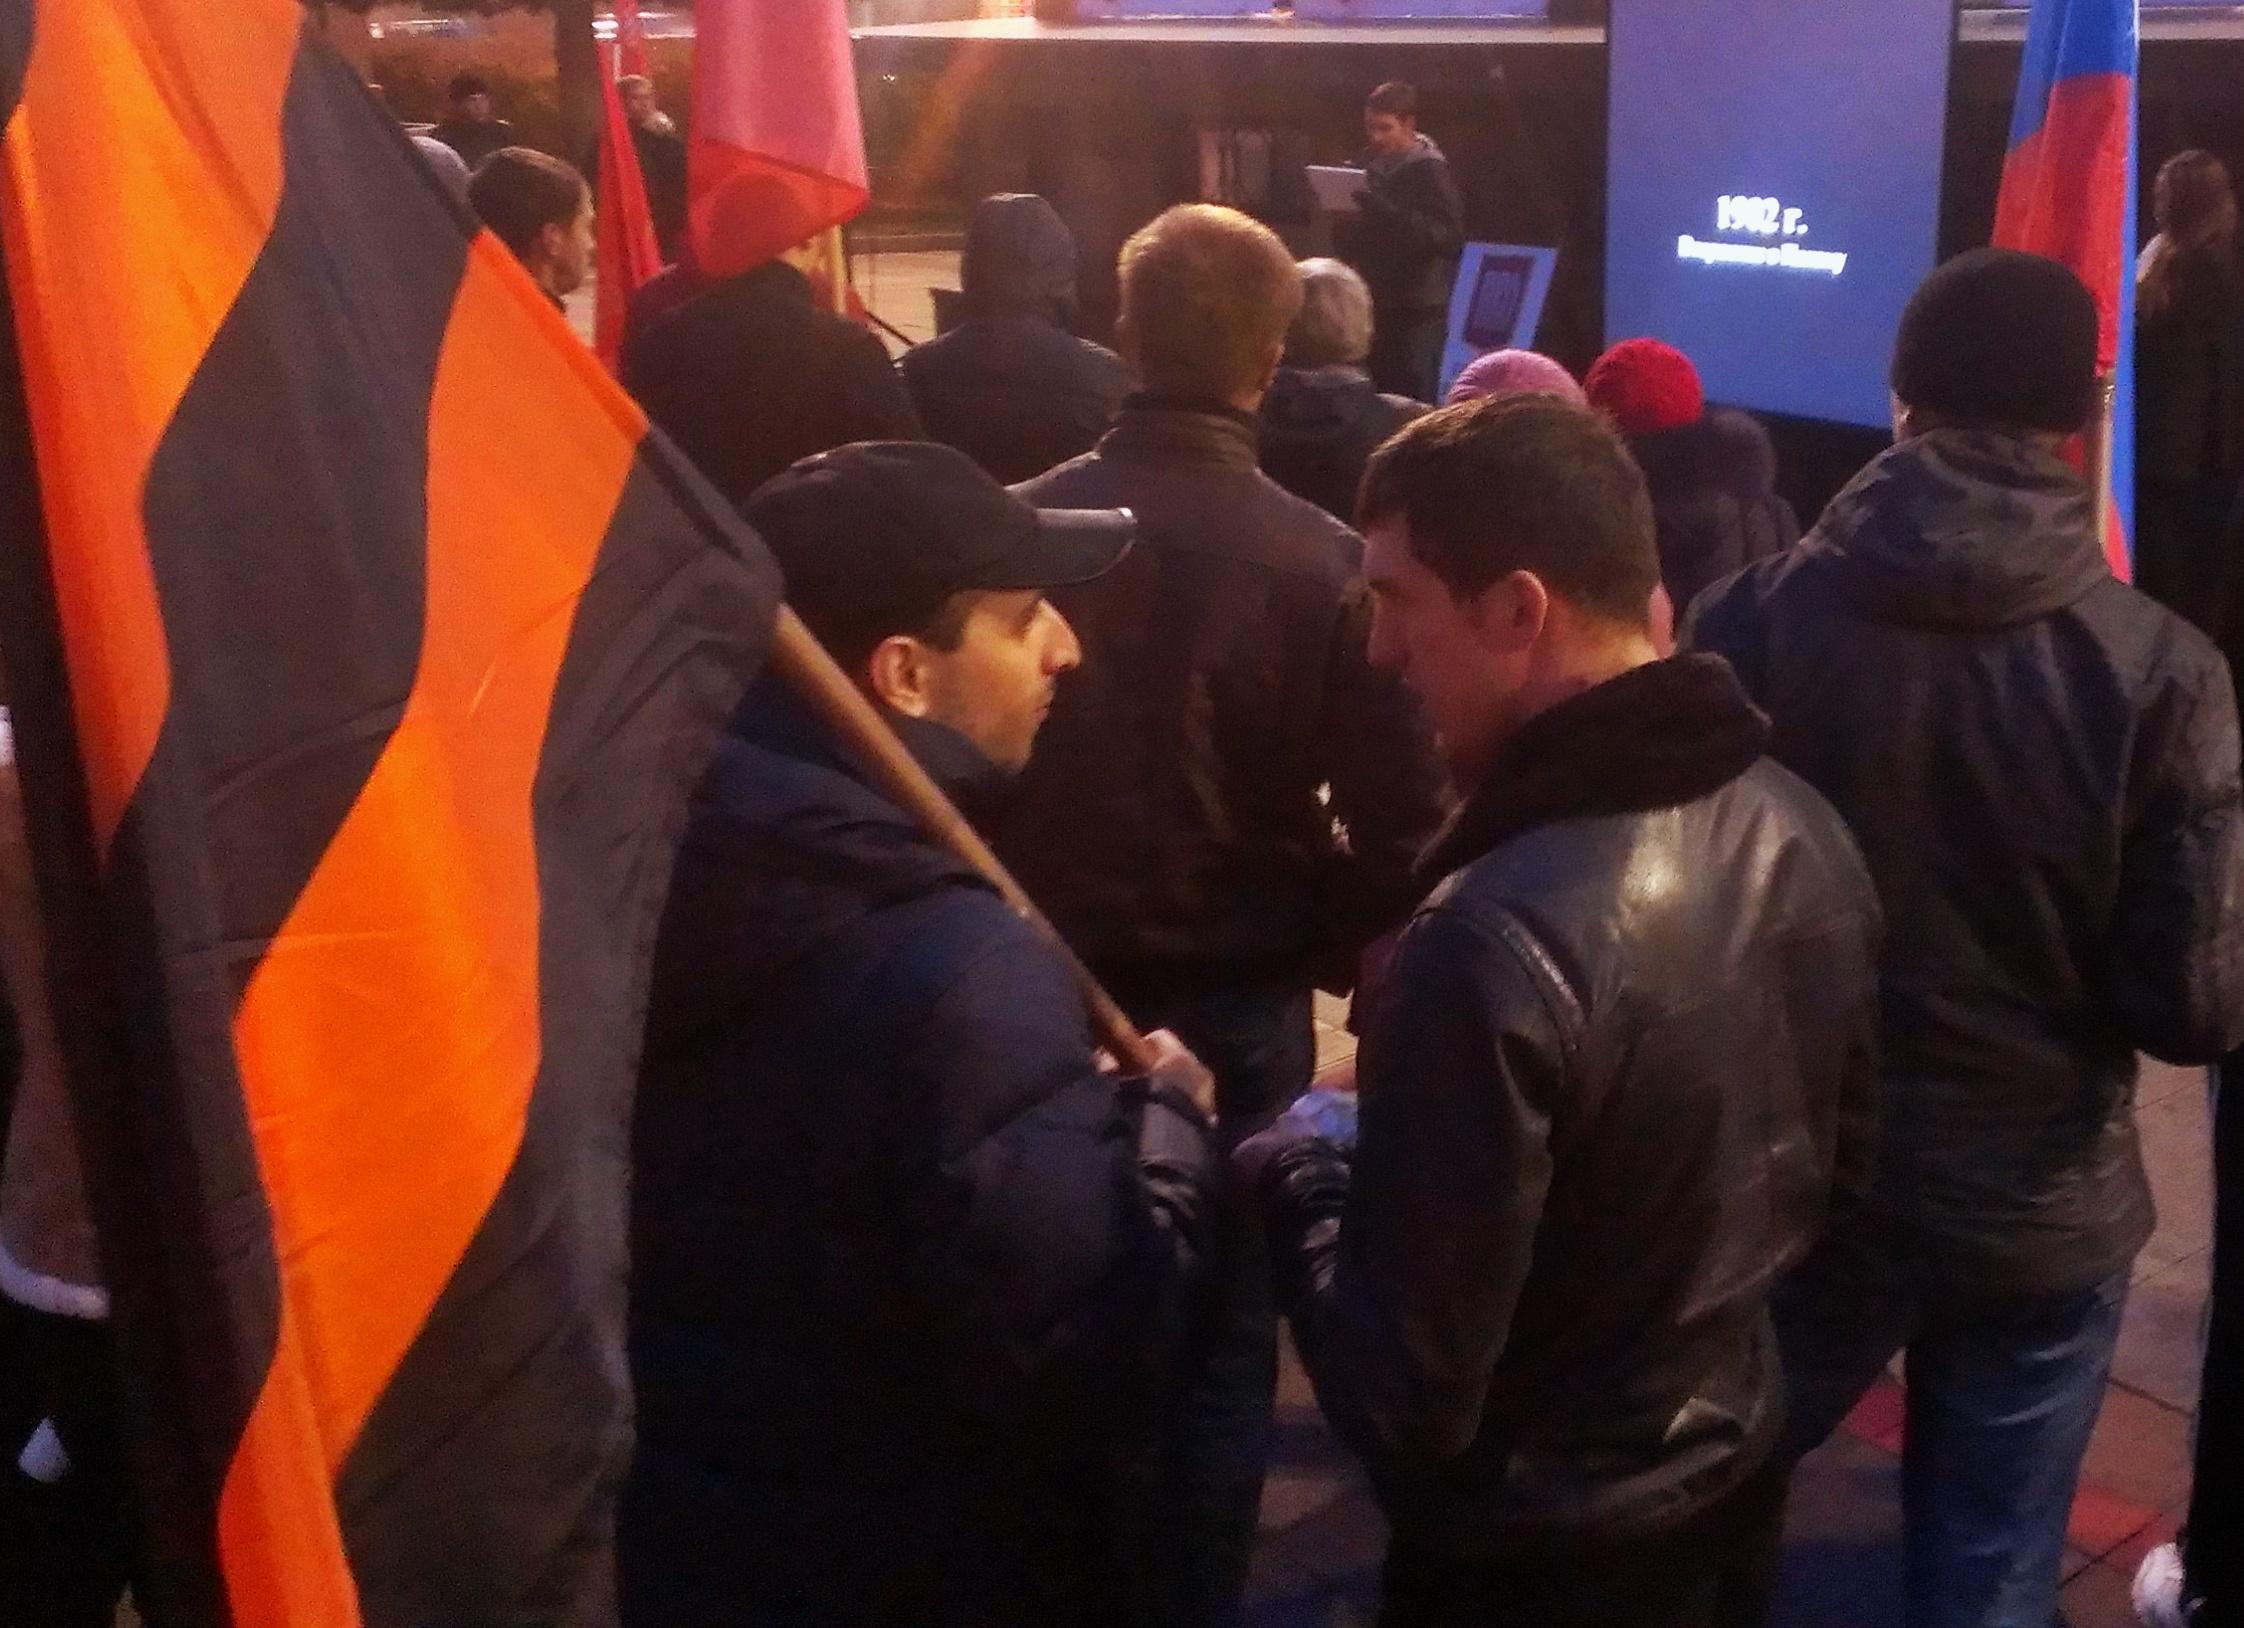 Националисты помянули Каддафи на митинге в Екатеринбурге